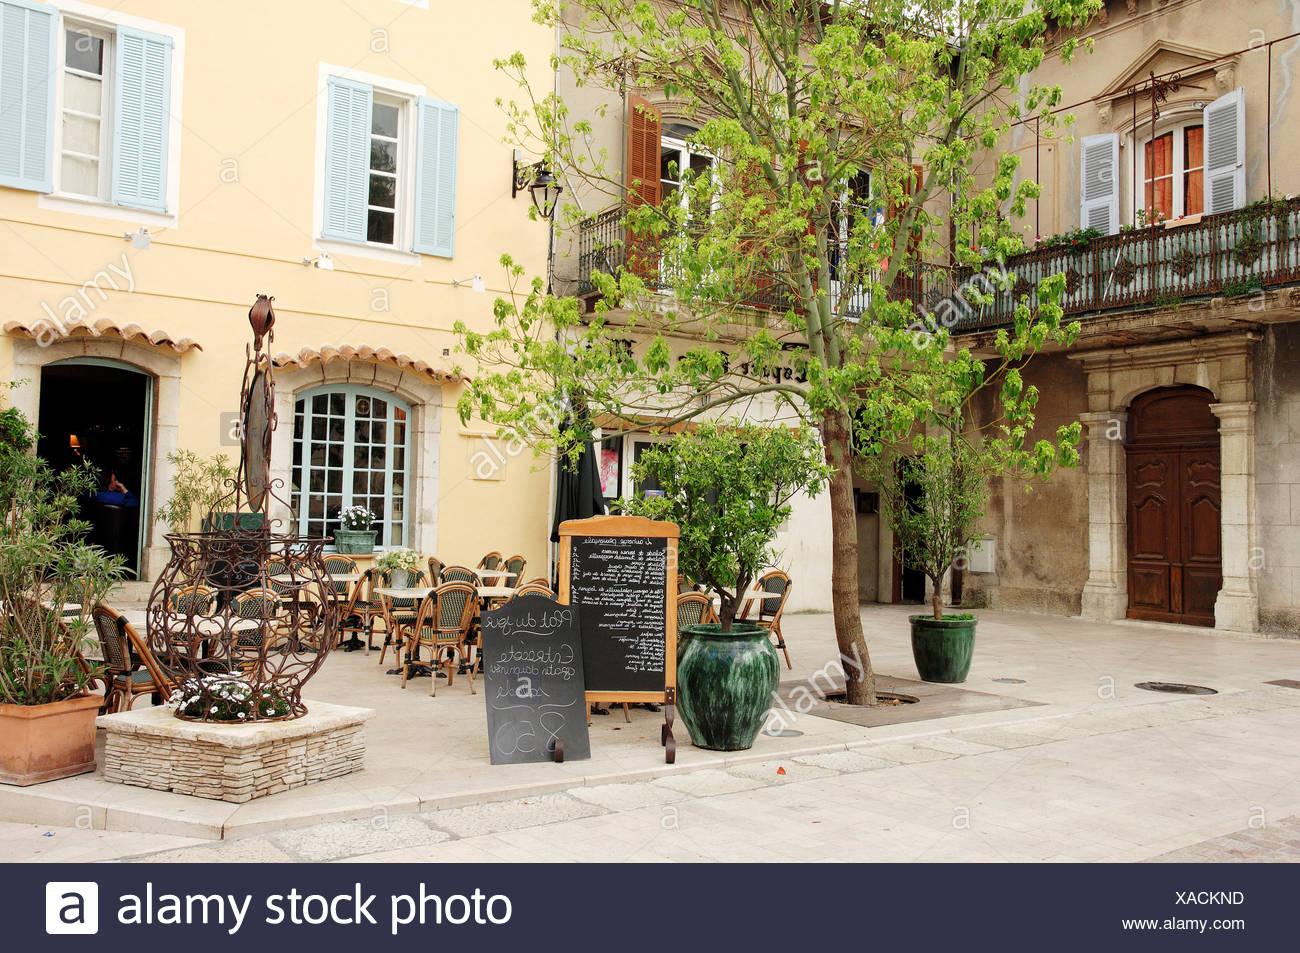 Restaurant, La Colle sur Loup, Alpes-Maritimes, Provence-Alpes-Cote d'Azur, Southern France, France, Europe, France, Europe - Stock Image